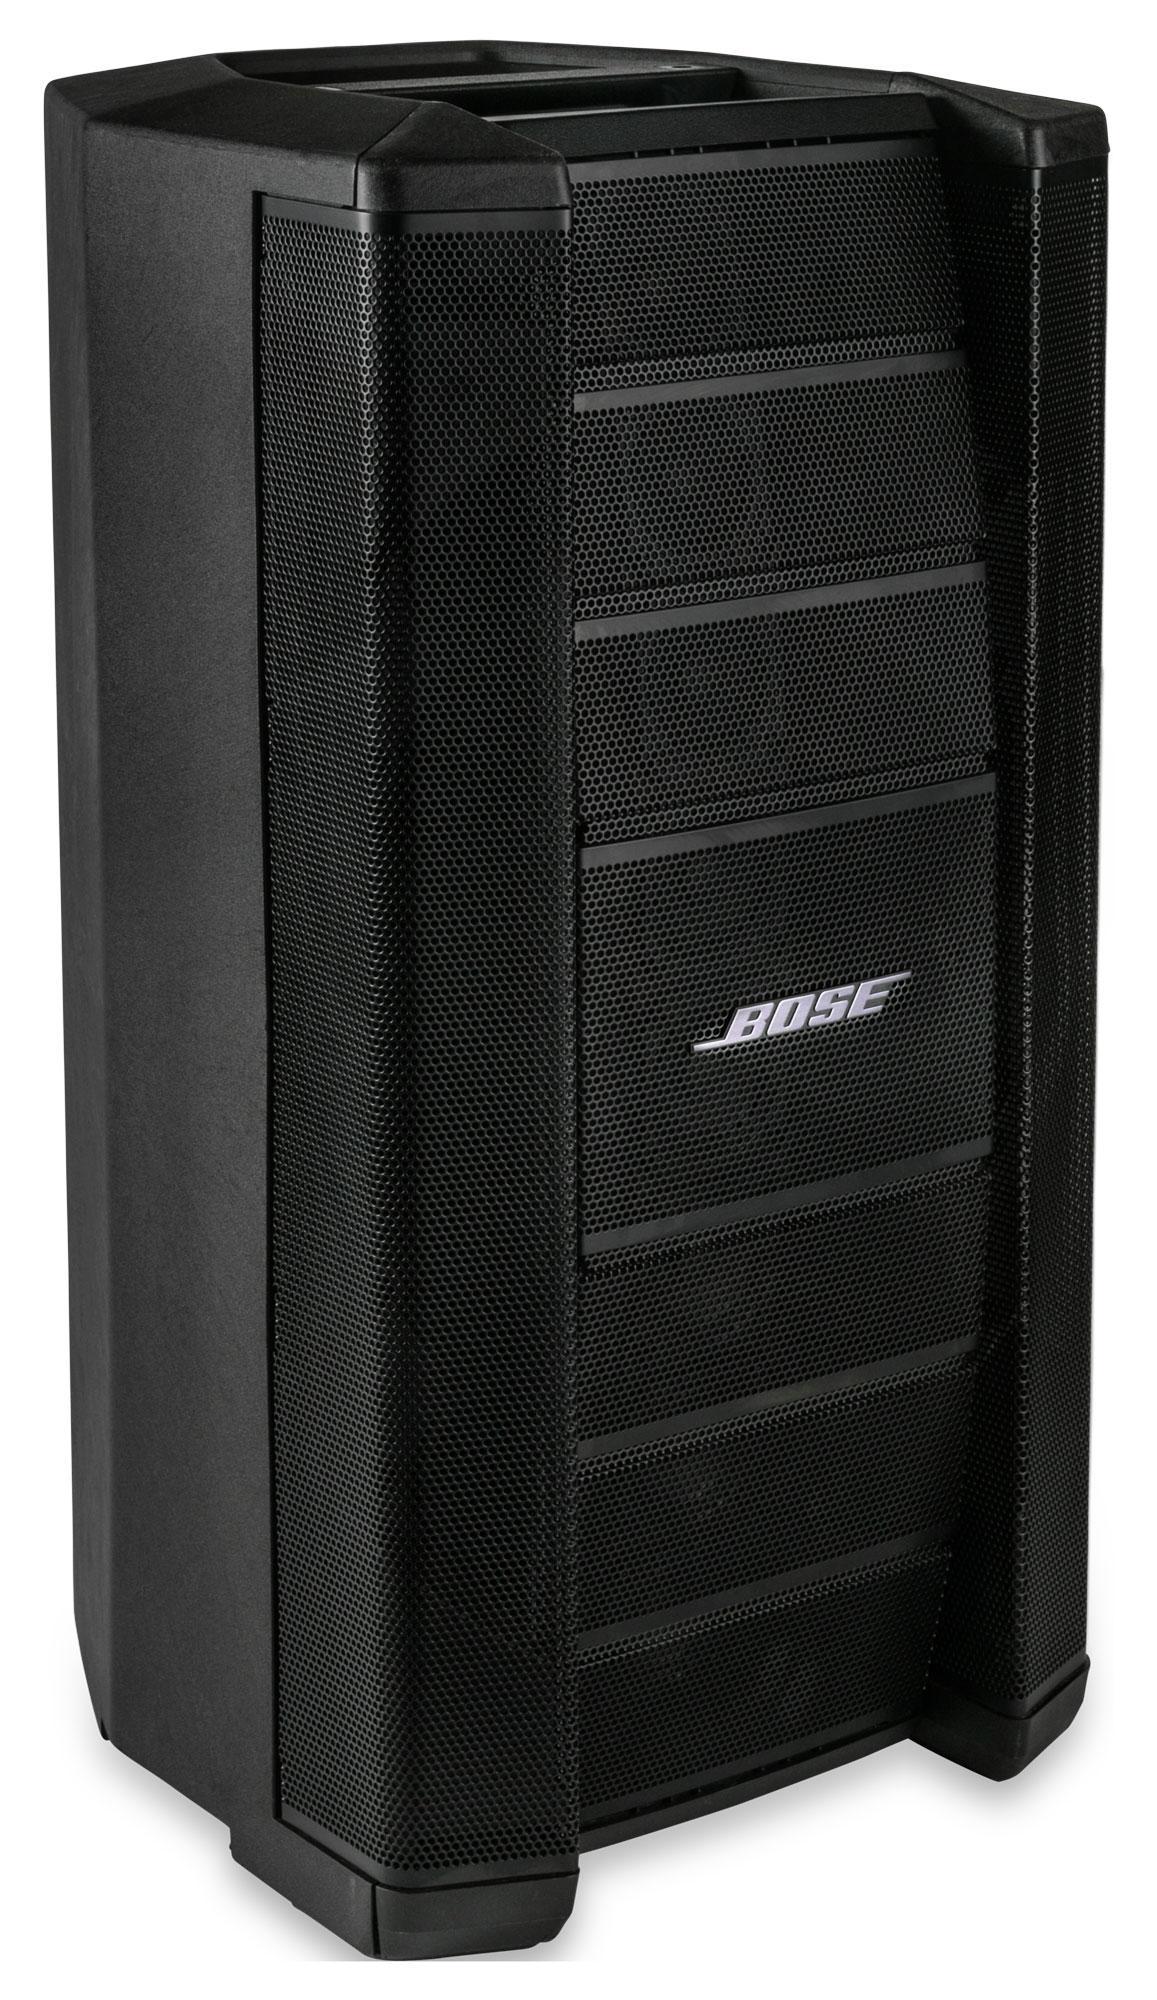 Bose F1 Model 812 Flexible Array Lautsprecher Retoure (Zustand sehr gut)